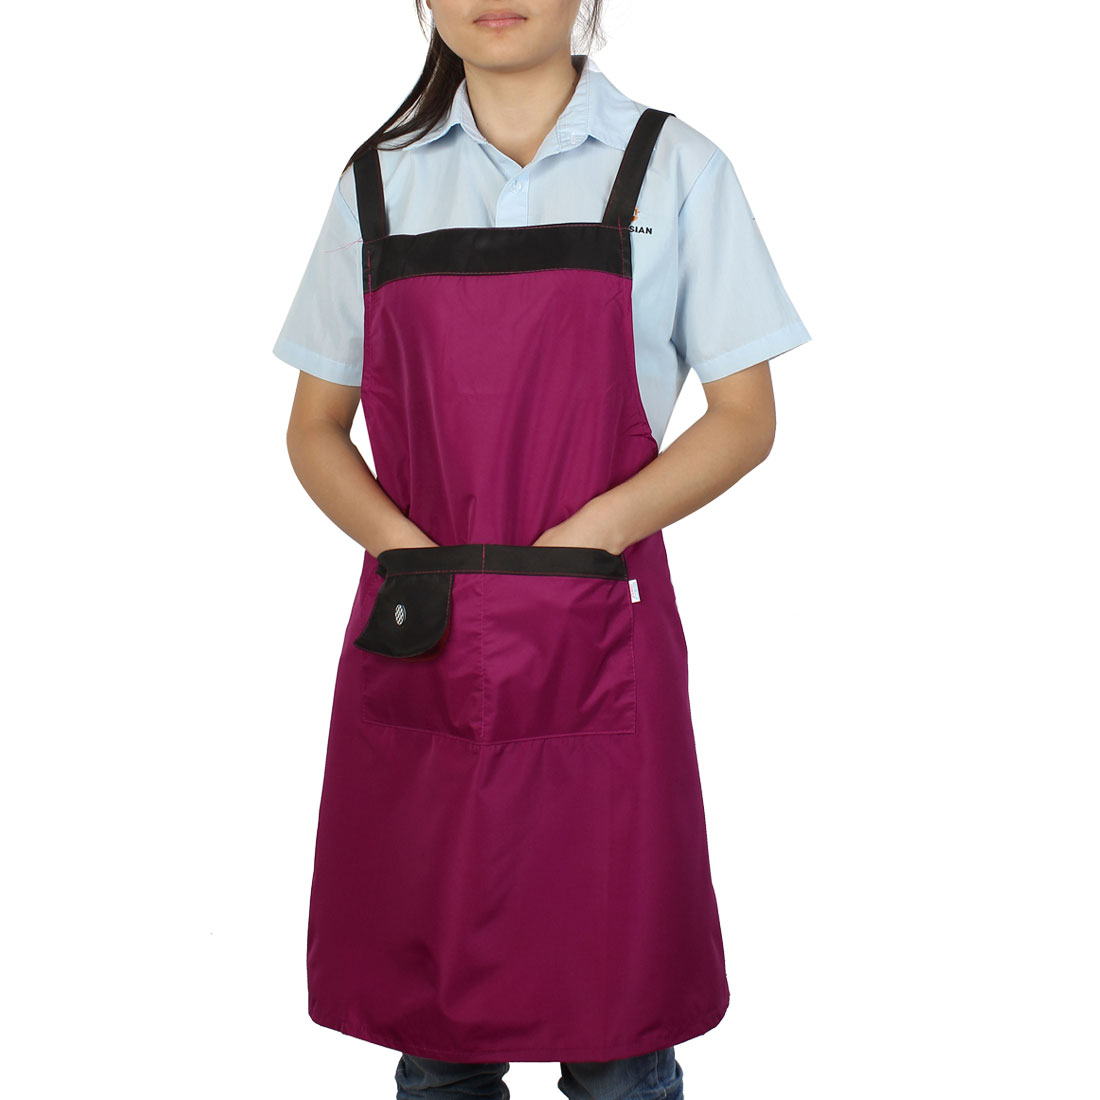 Kitchen Restaurant Women Cooking Self Tie Dual Pocket Bib Apron Dress Burgundy